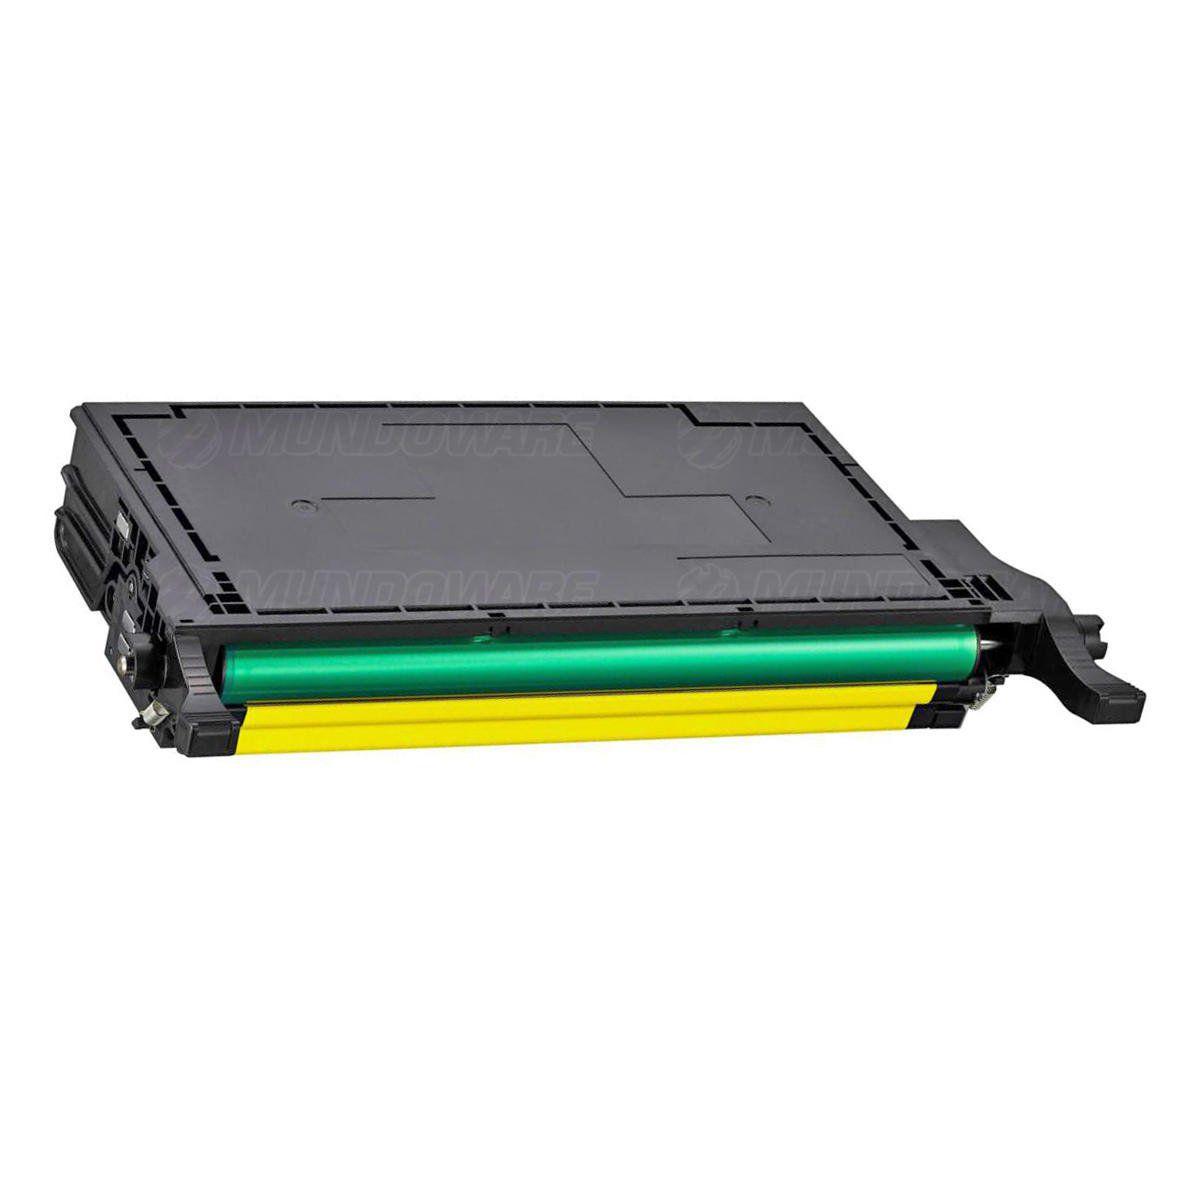 Compatível: Toner CLT-Y609S 609S para Samsung CLP-770 CLP-775 CLP-770nd CLP-775nd CLP770nd CLP775nd / Amarelo / 7.000